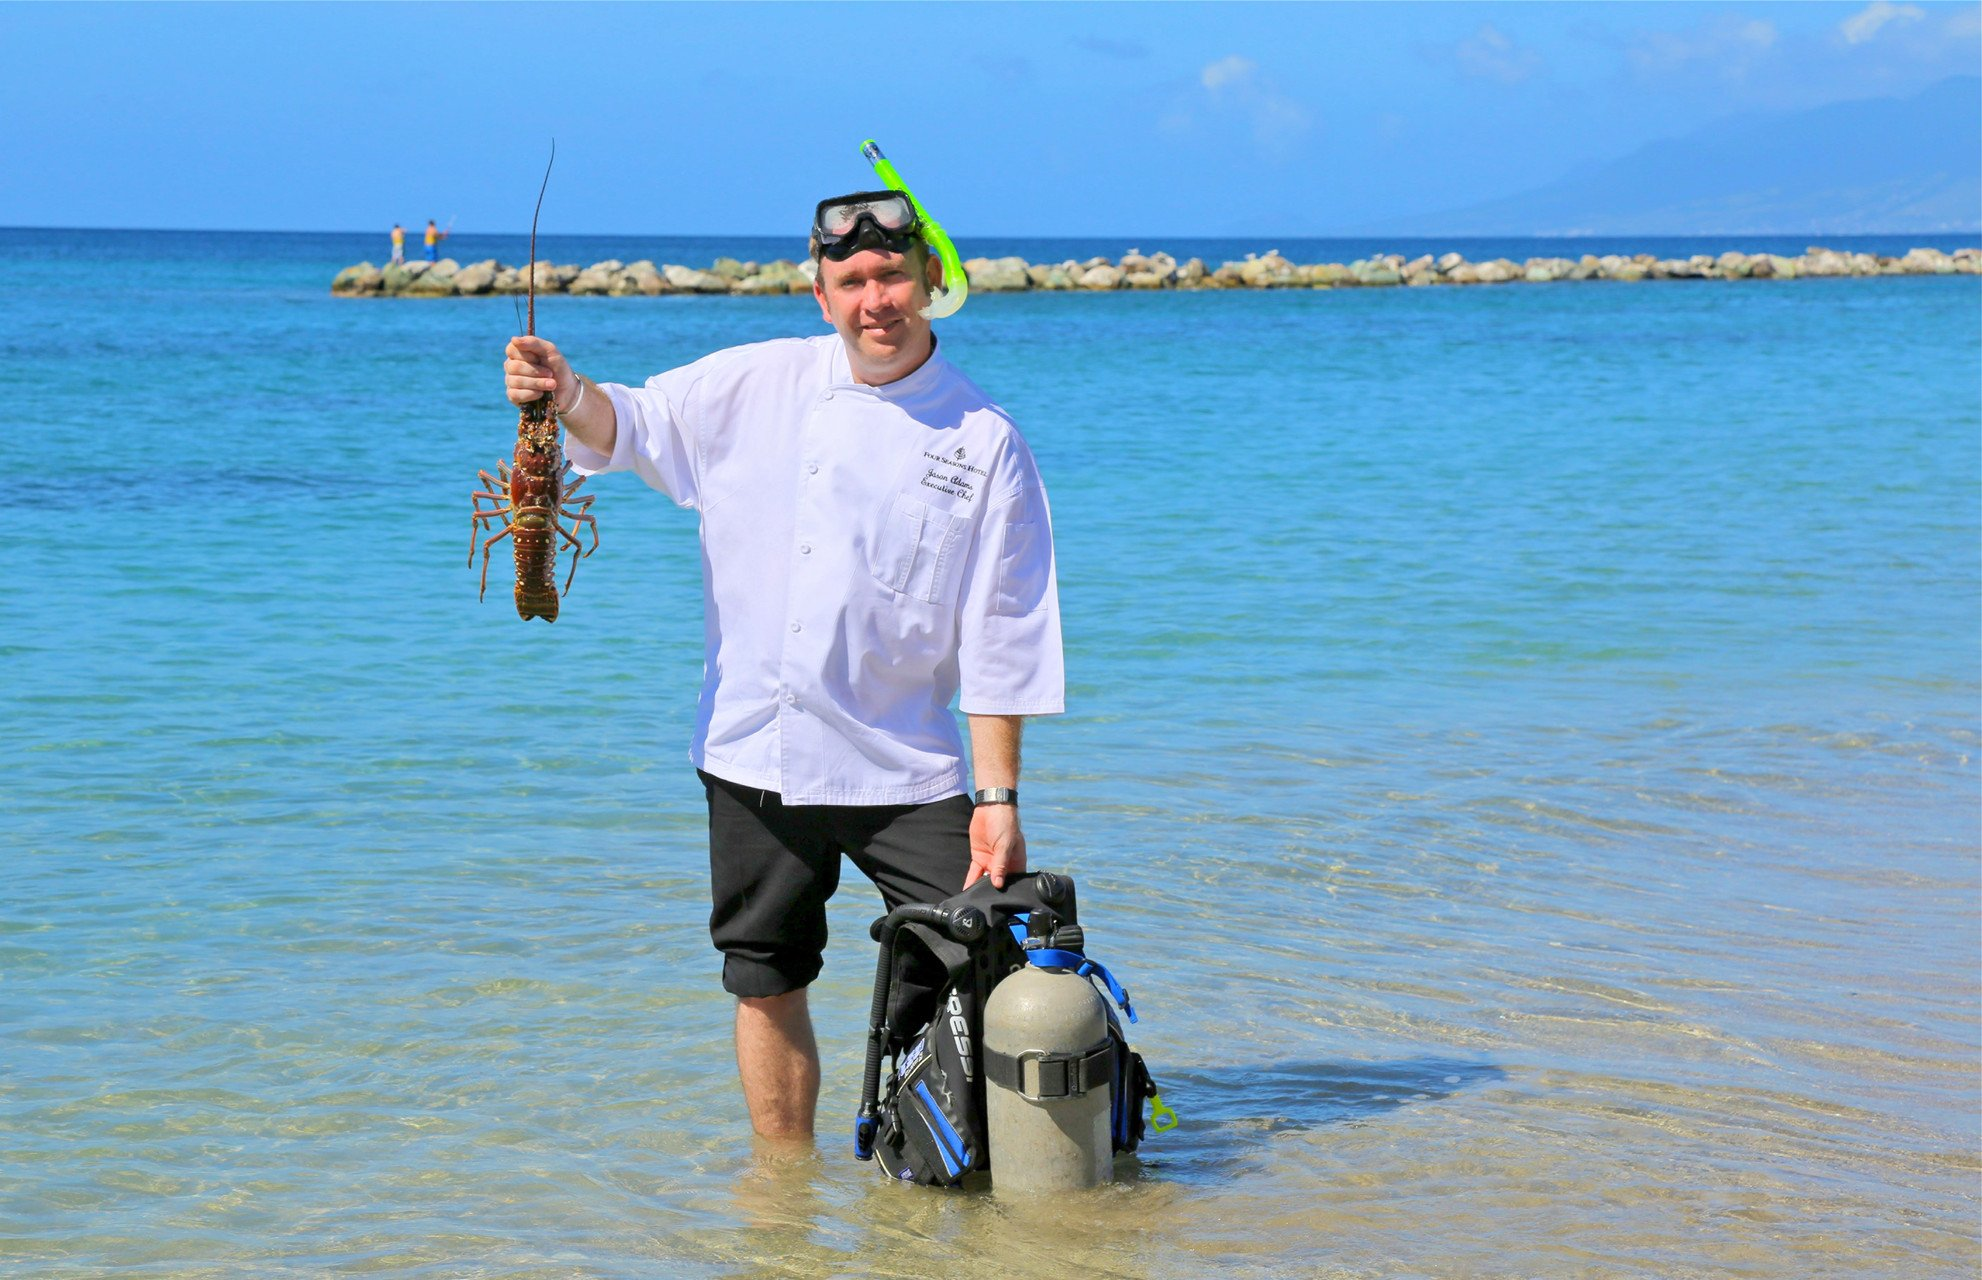 tennis-tourist-four-seasons-nevis-diving-for-lobster-courtesy-four-seasons